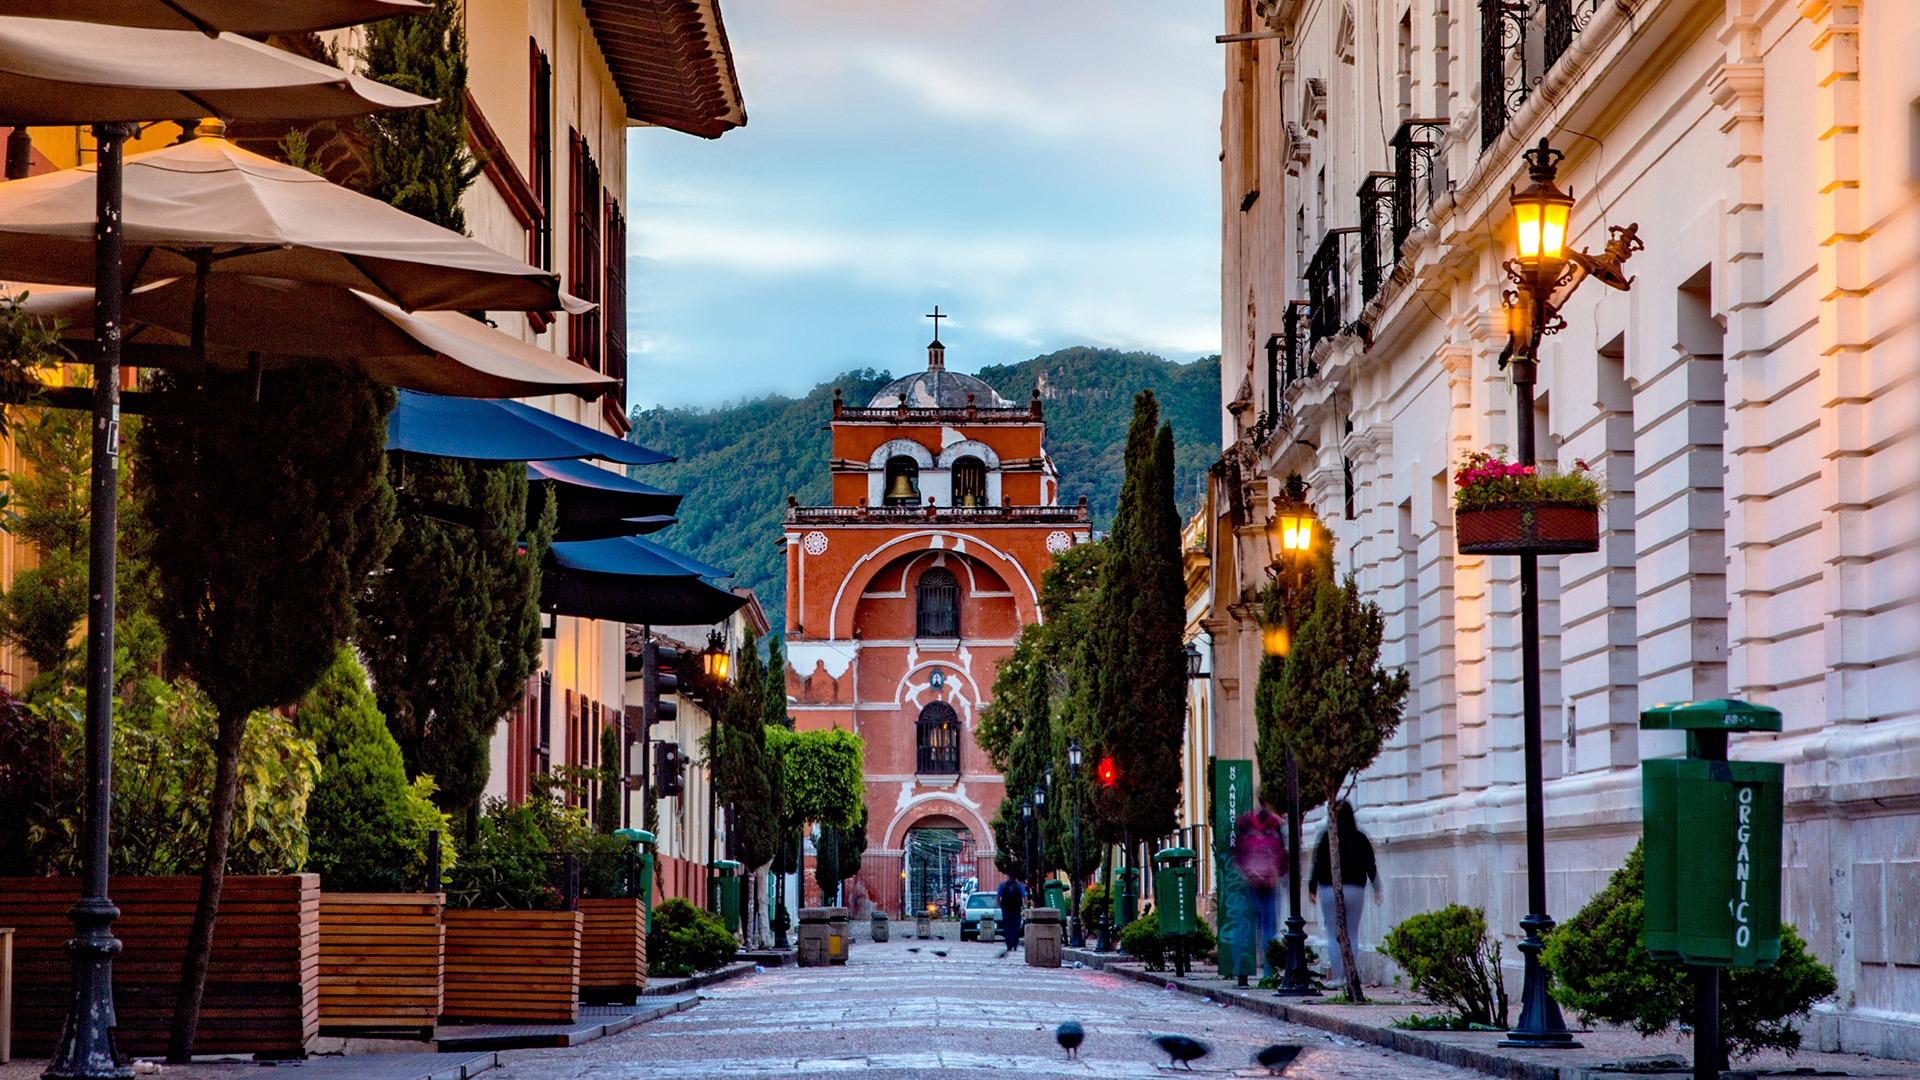 Charming streets of San Cristobal de las Casas, Mexico